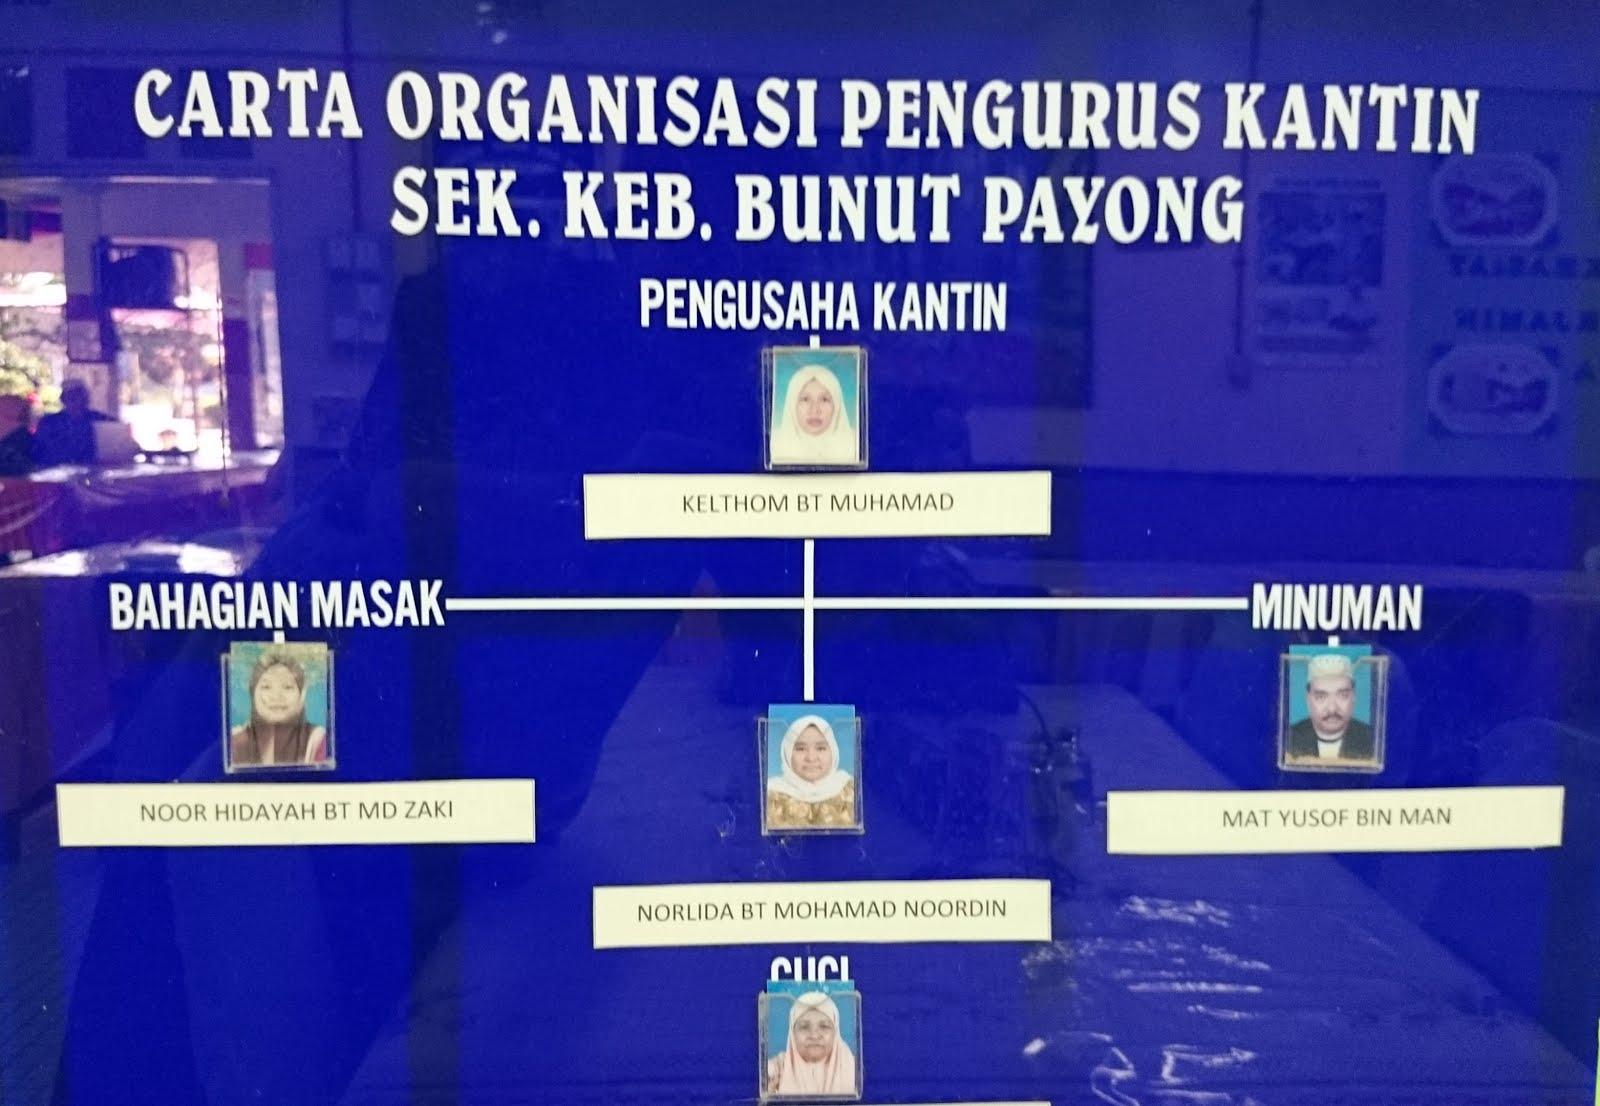 Organisasi Pengurusan Kantin